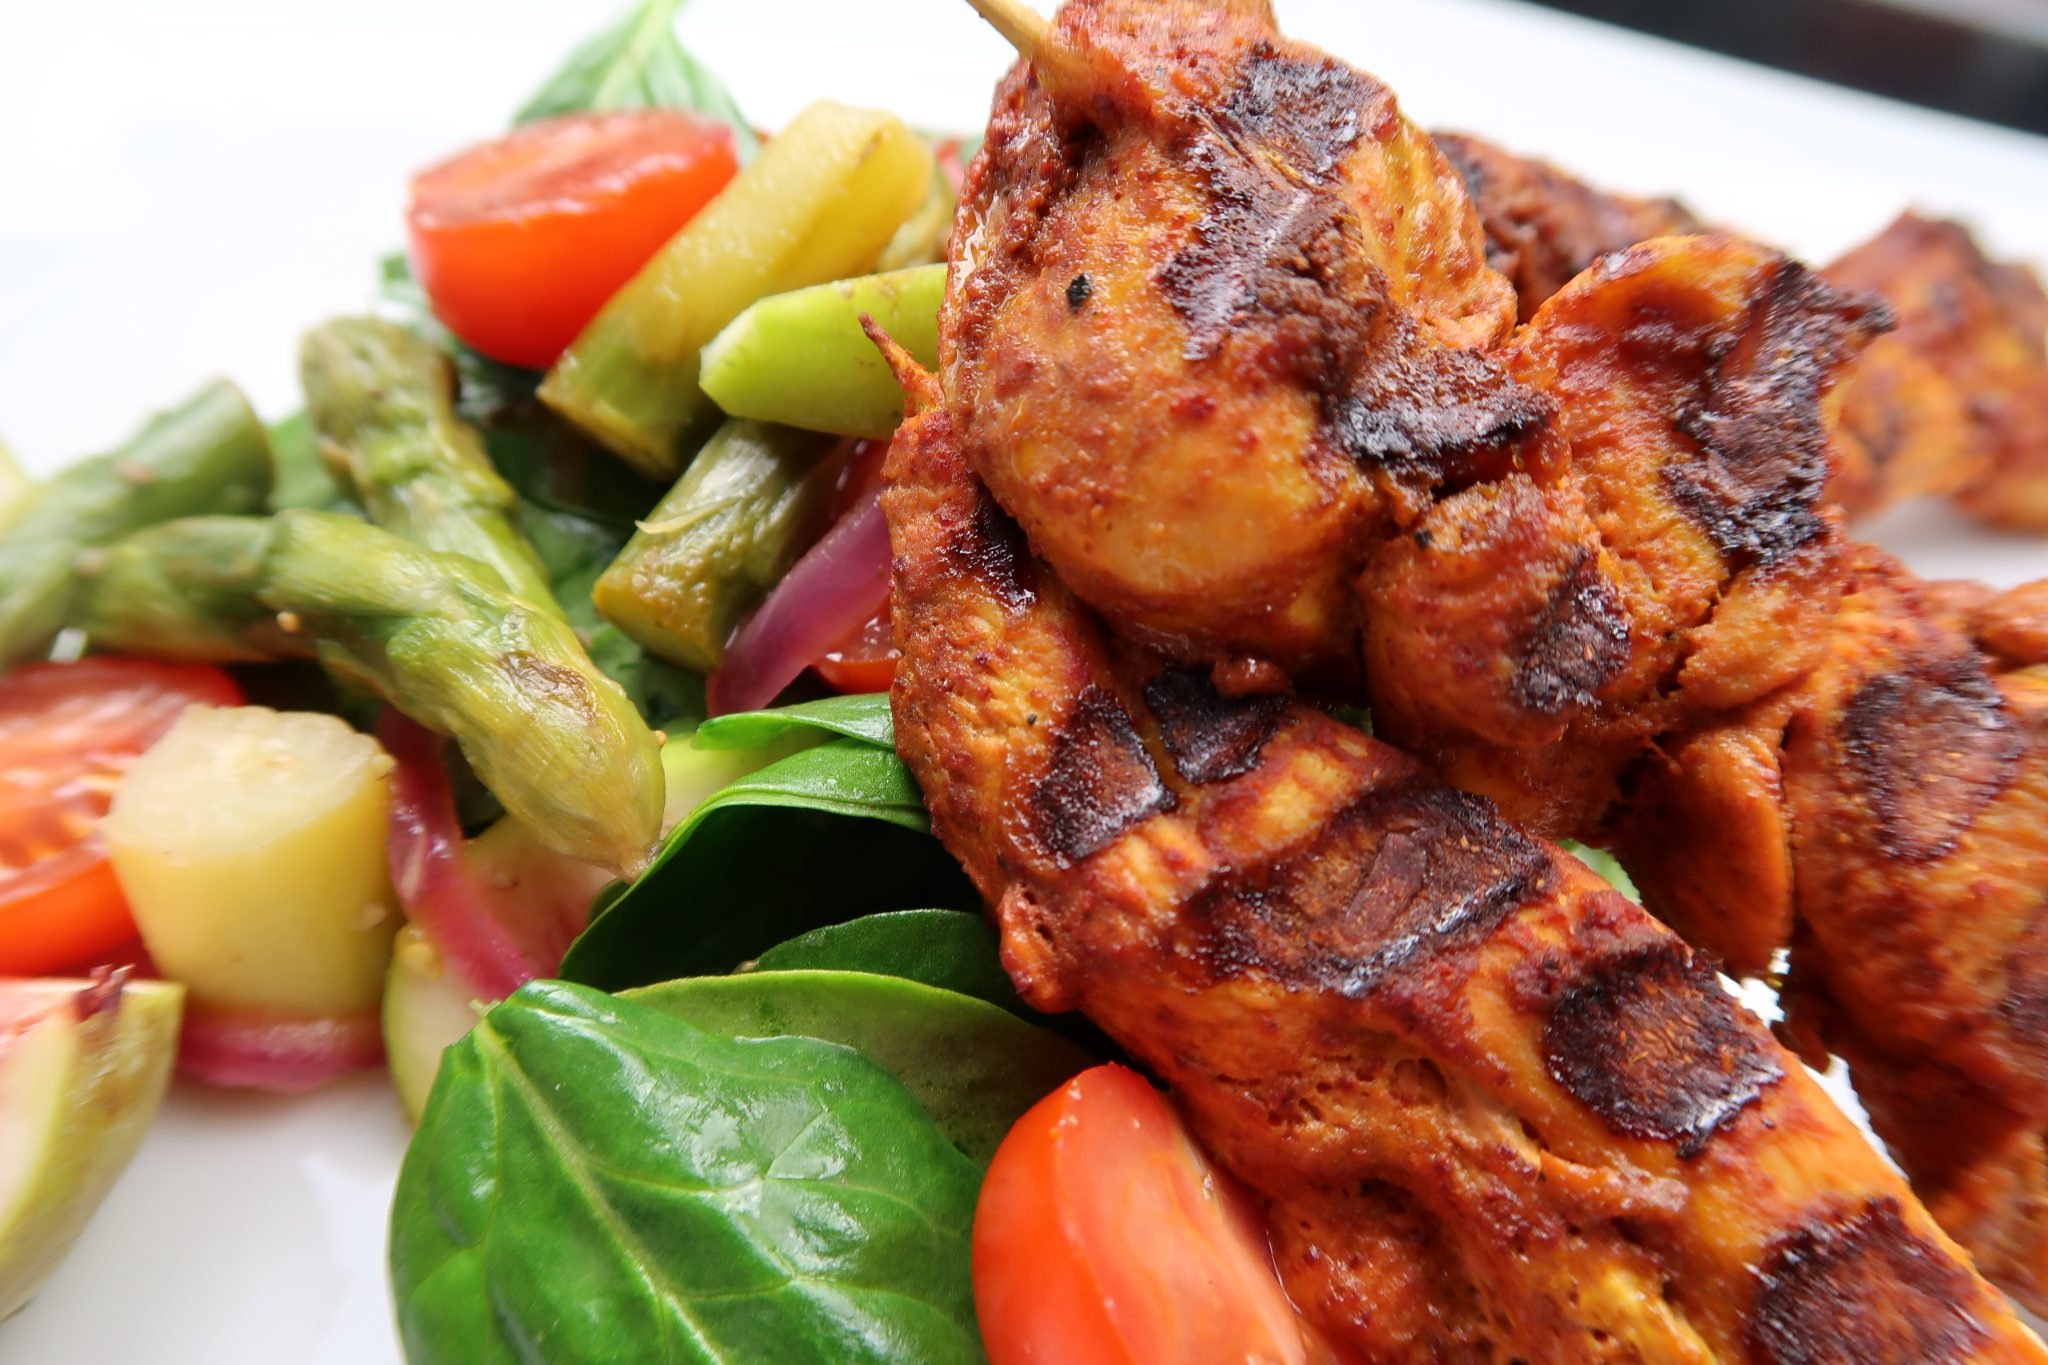 h hnchen tandoori mit spinat spargel feigen salat fitness meets food. Black Bedroom Furniture Sets. Home Design Ideas